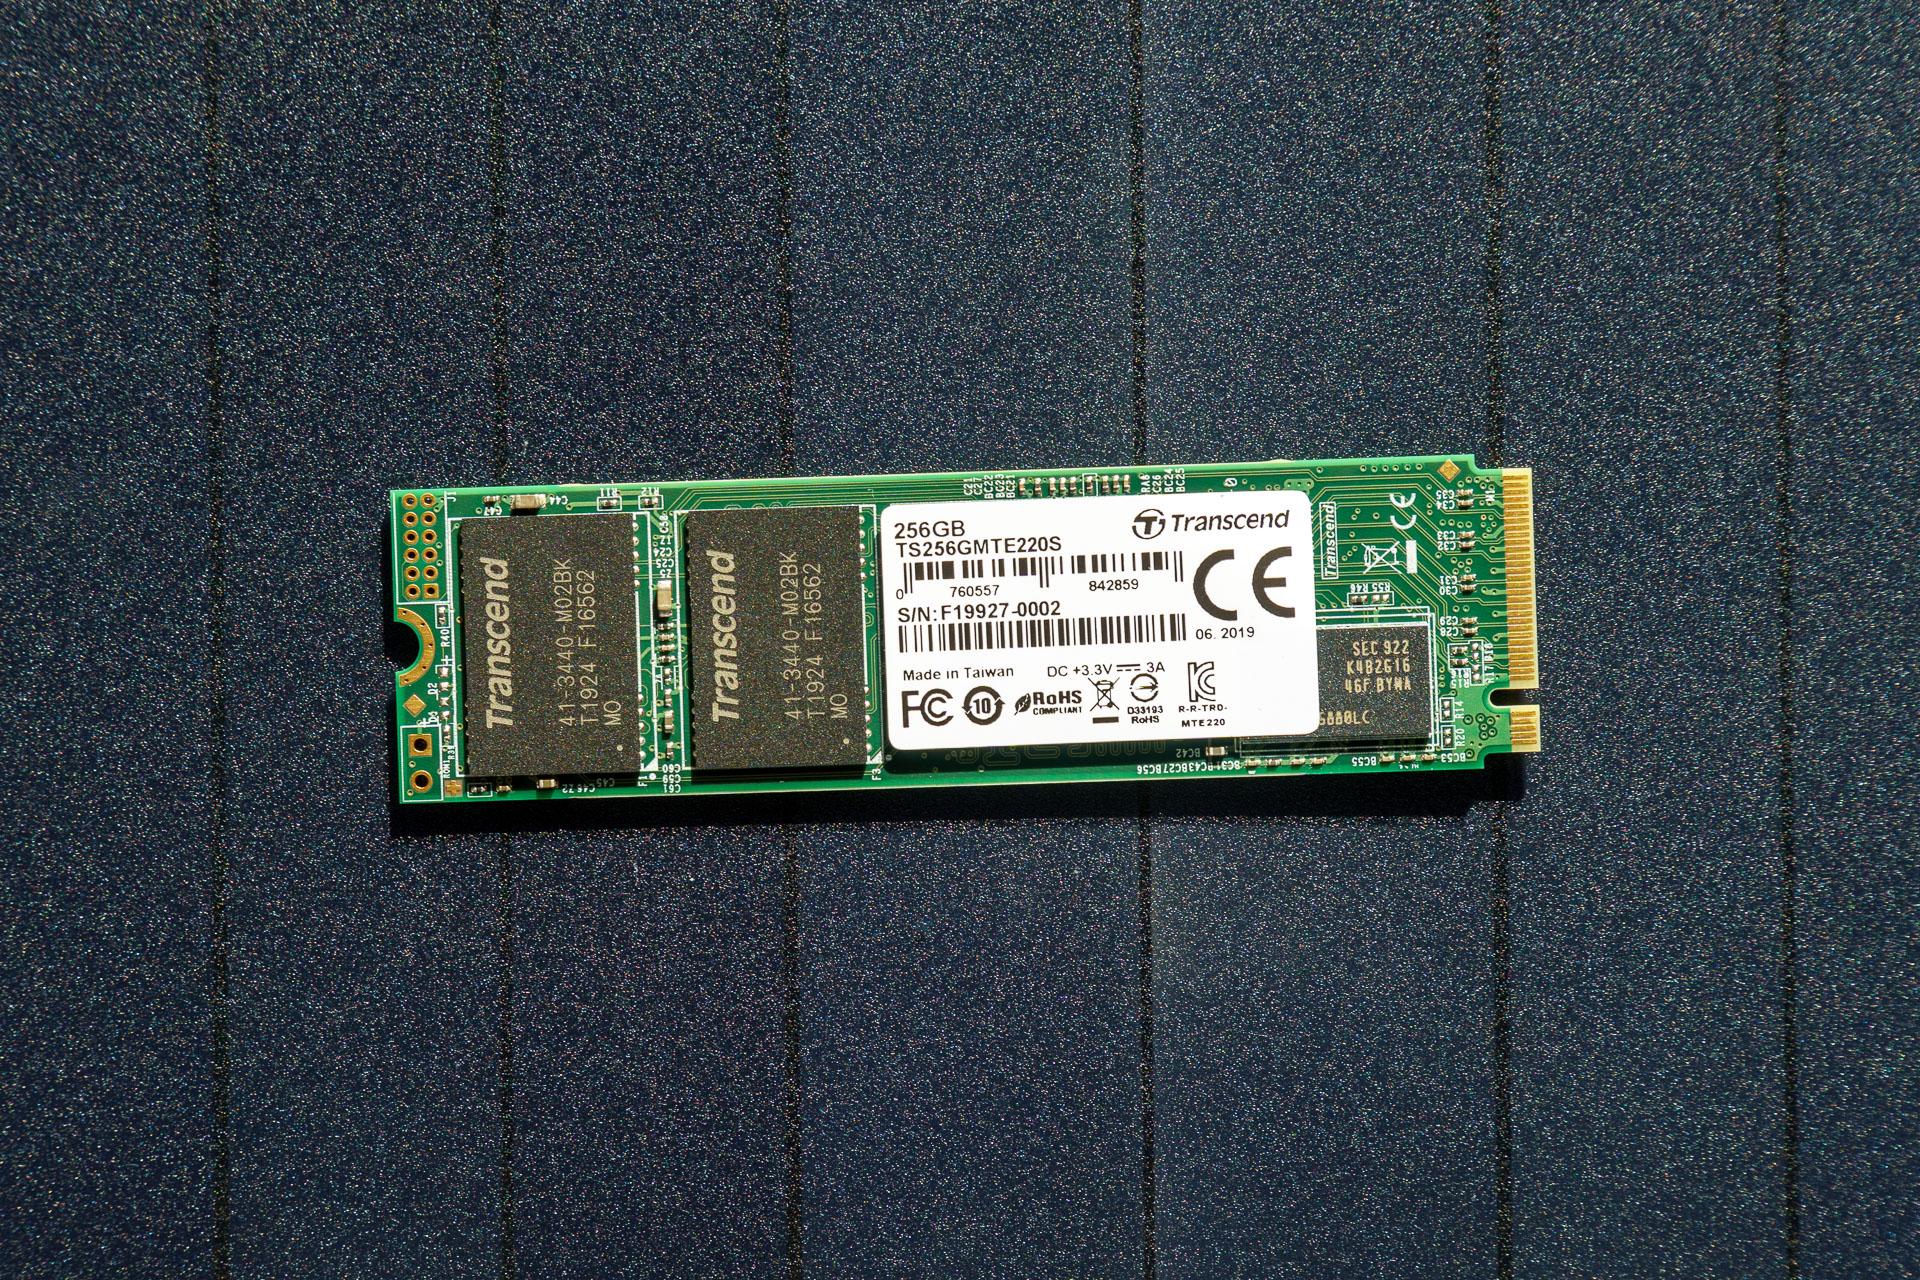 Recenzja dysku Transcend SSD S220 - wart uwagi 26